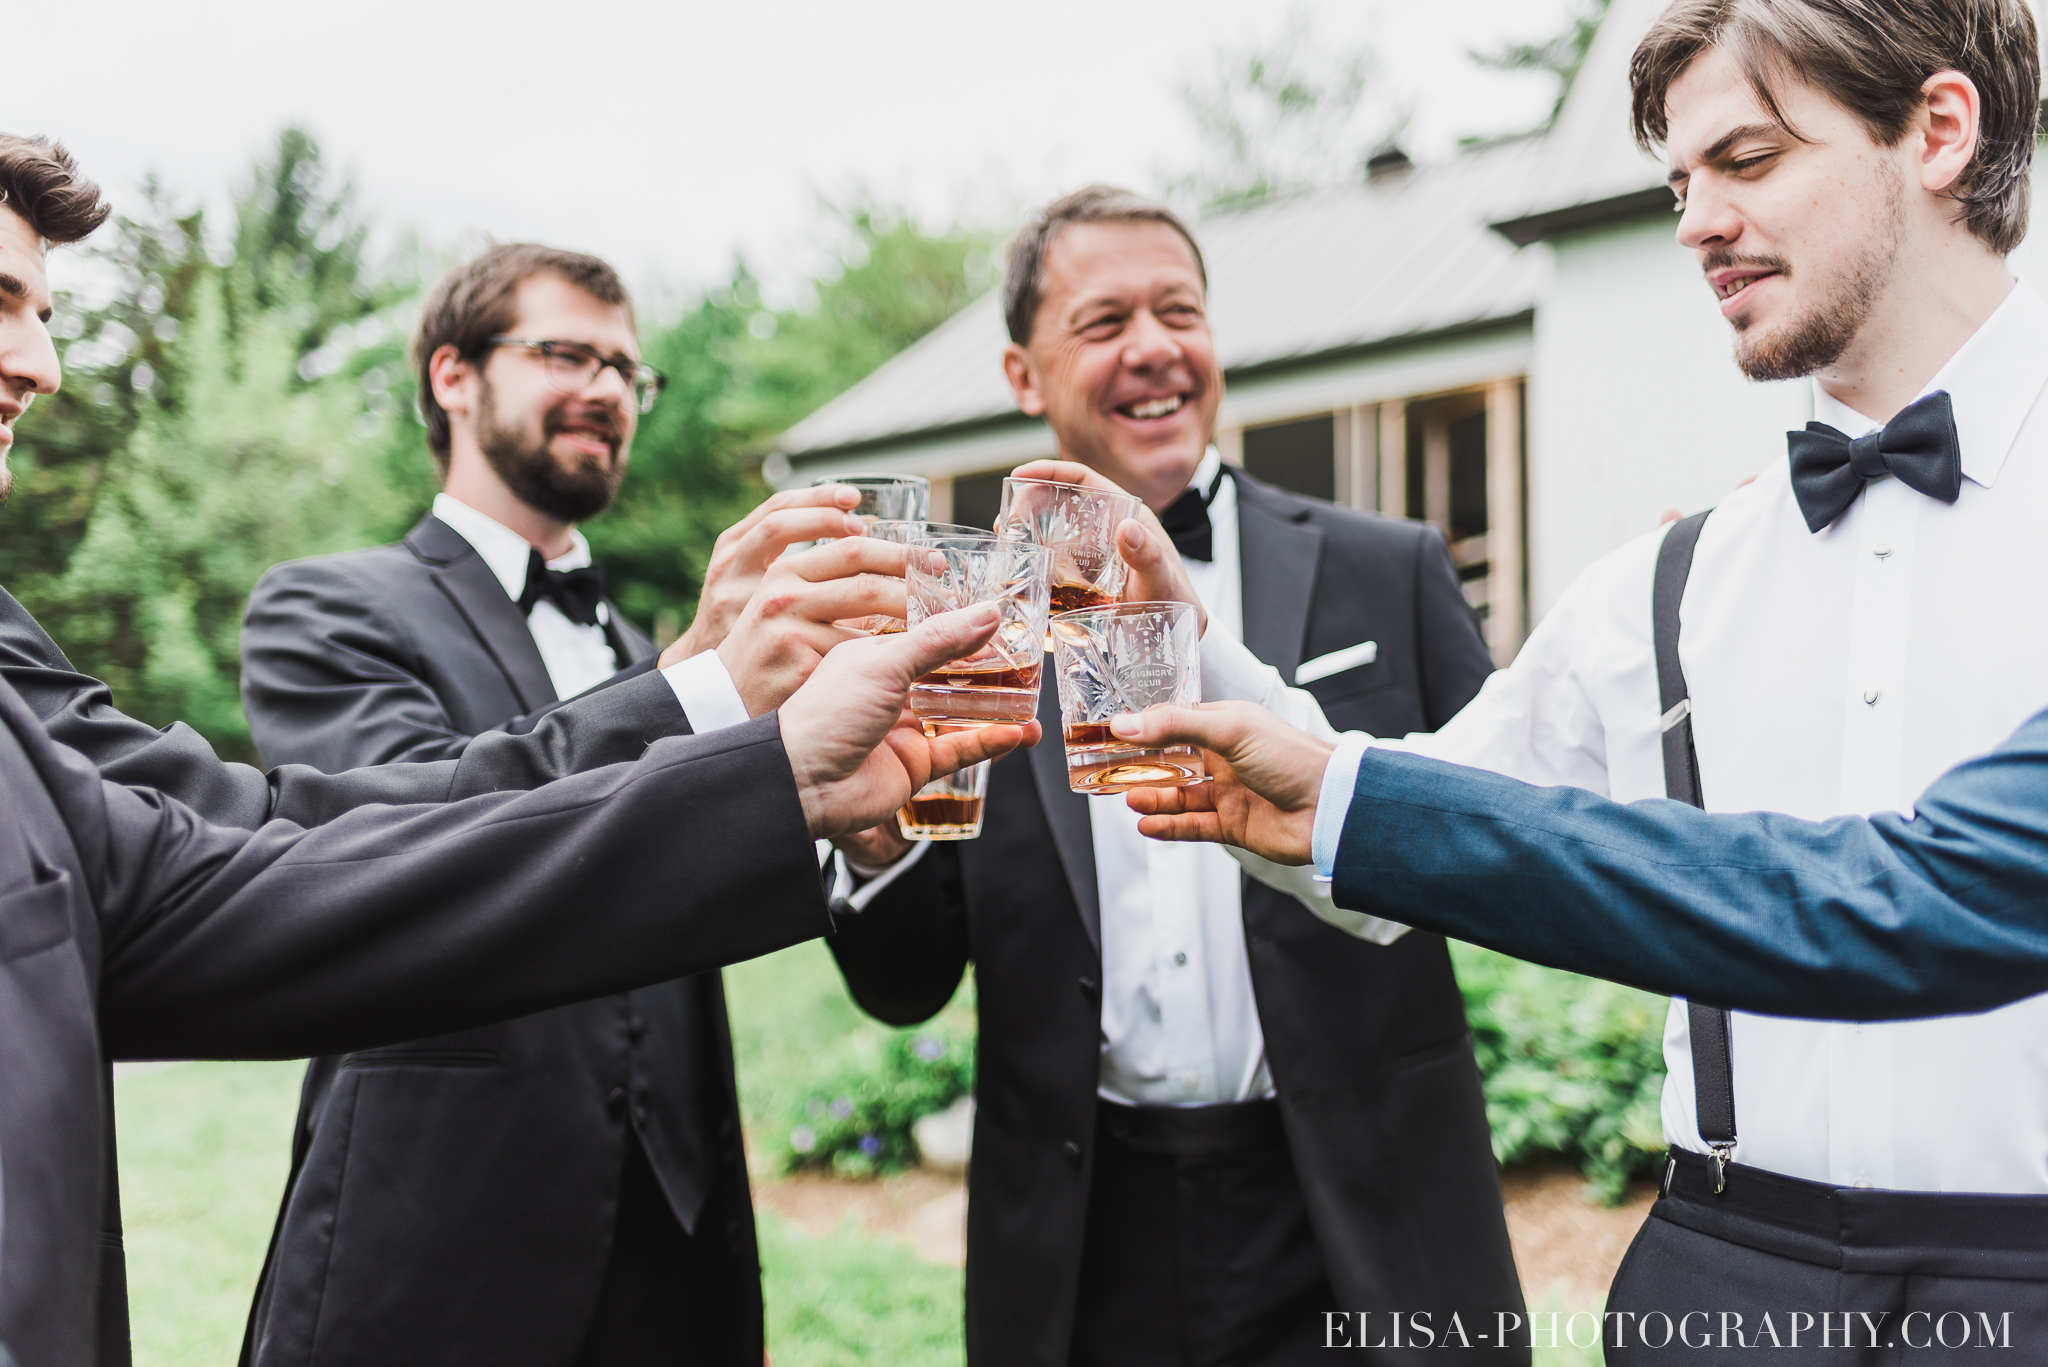 photo mariage a la montagne domaine tomali maniatin preparatifs du marie scotch toast garcons honneur 5319 - Mariage à la montagne au domaine Tomali-Maniatyn